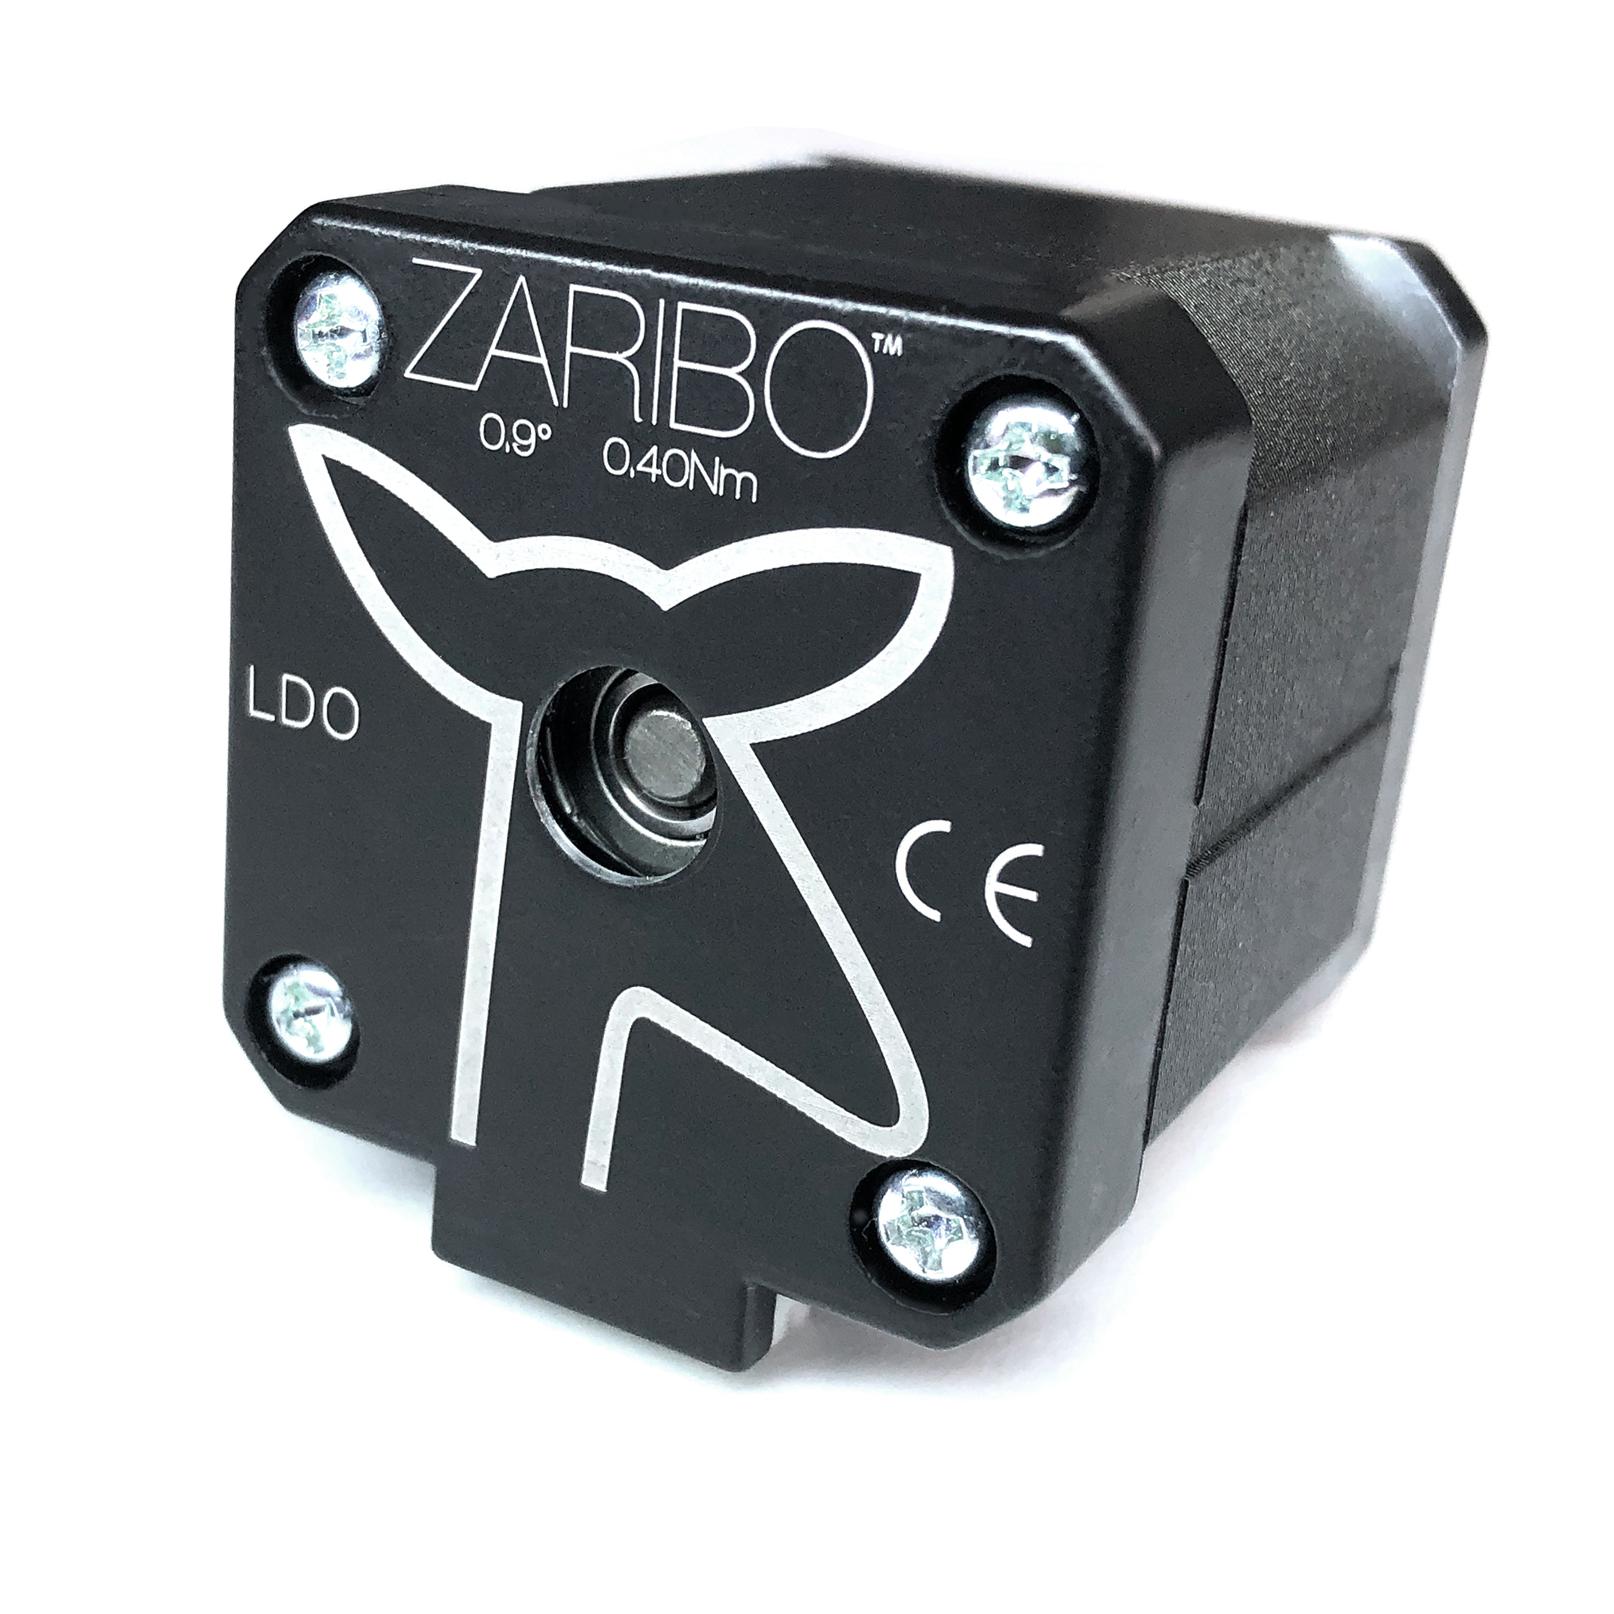 nema 17 stepper motor 0.9 degree 0.40nm for 3d printers prusa zaribo level cube